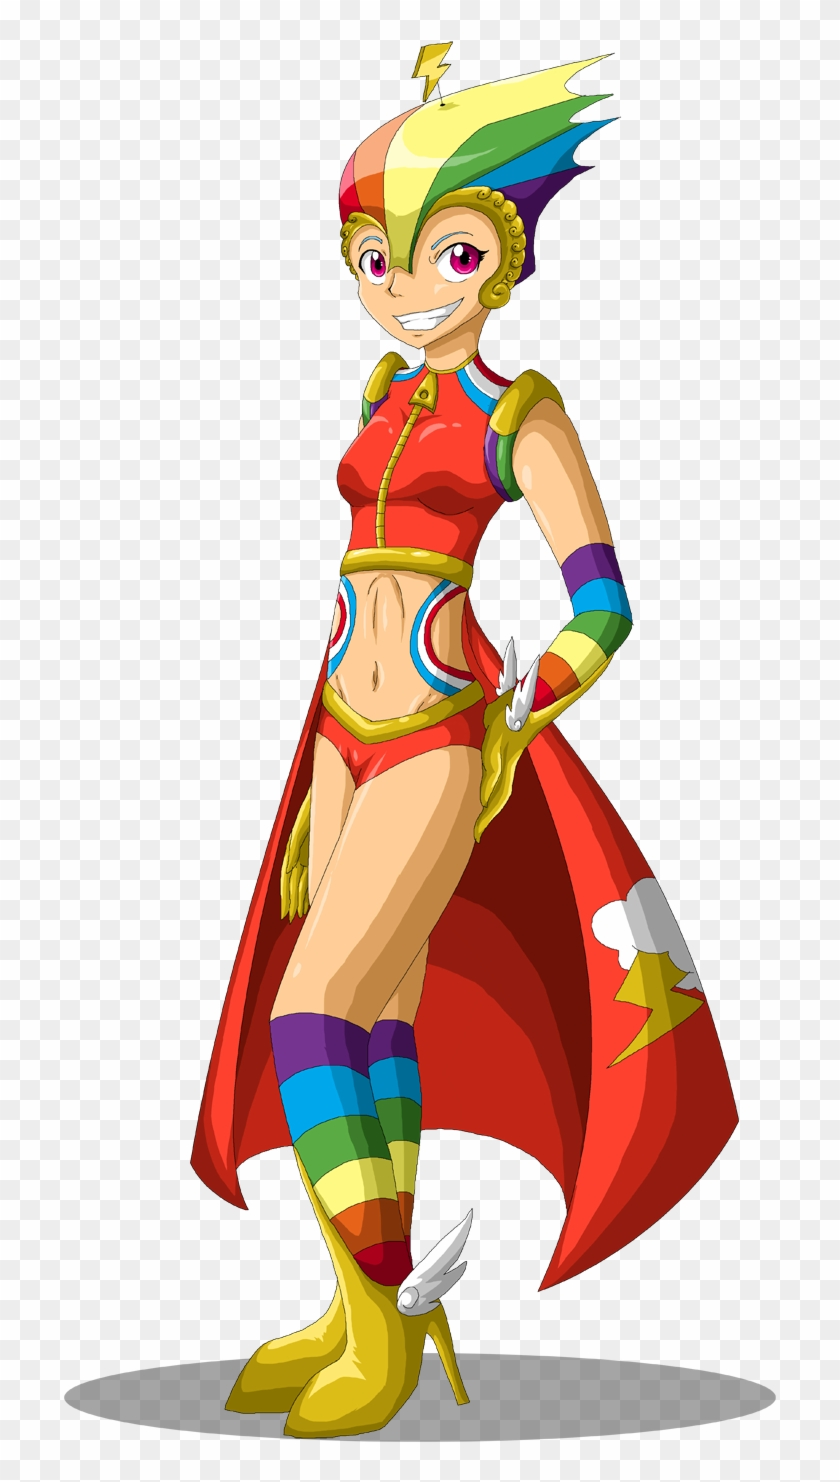 Applejack Minecraft Skins Mlp Rainbow Dash Human Dress